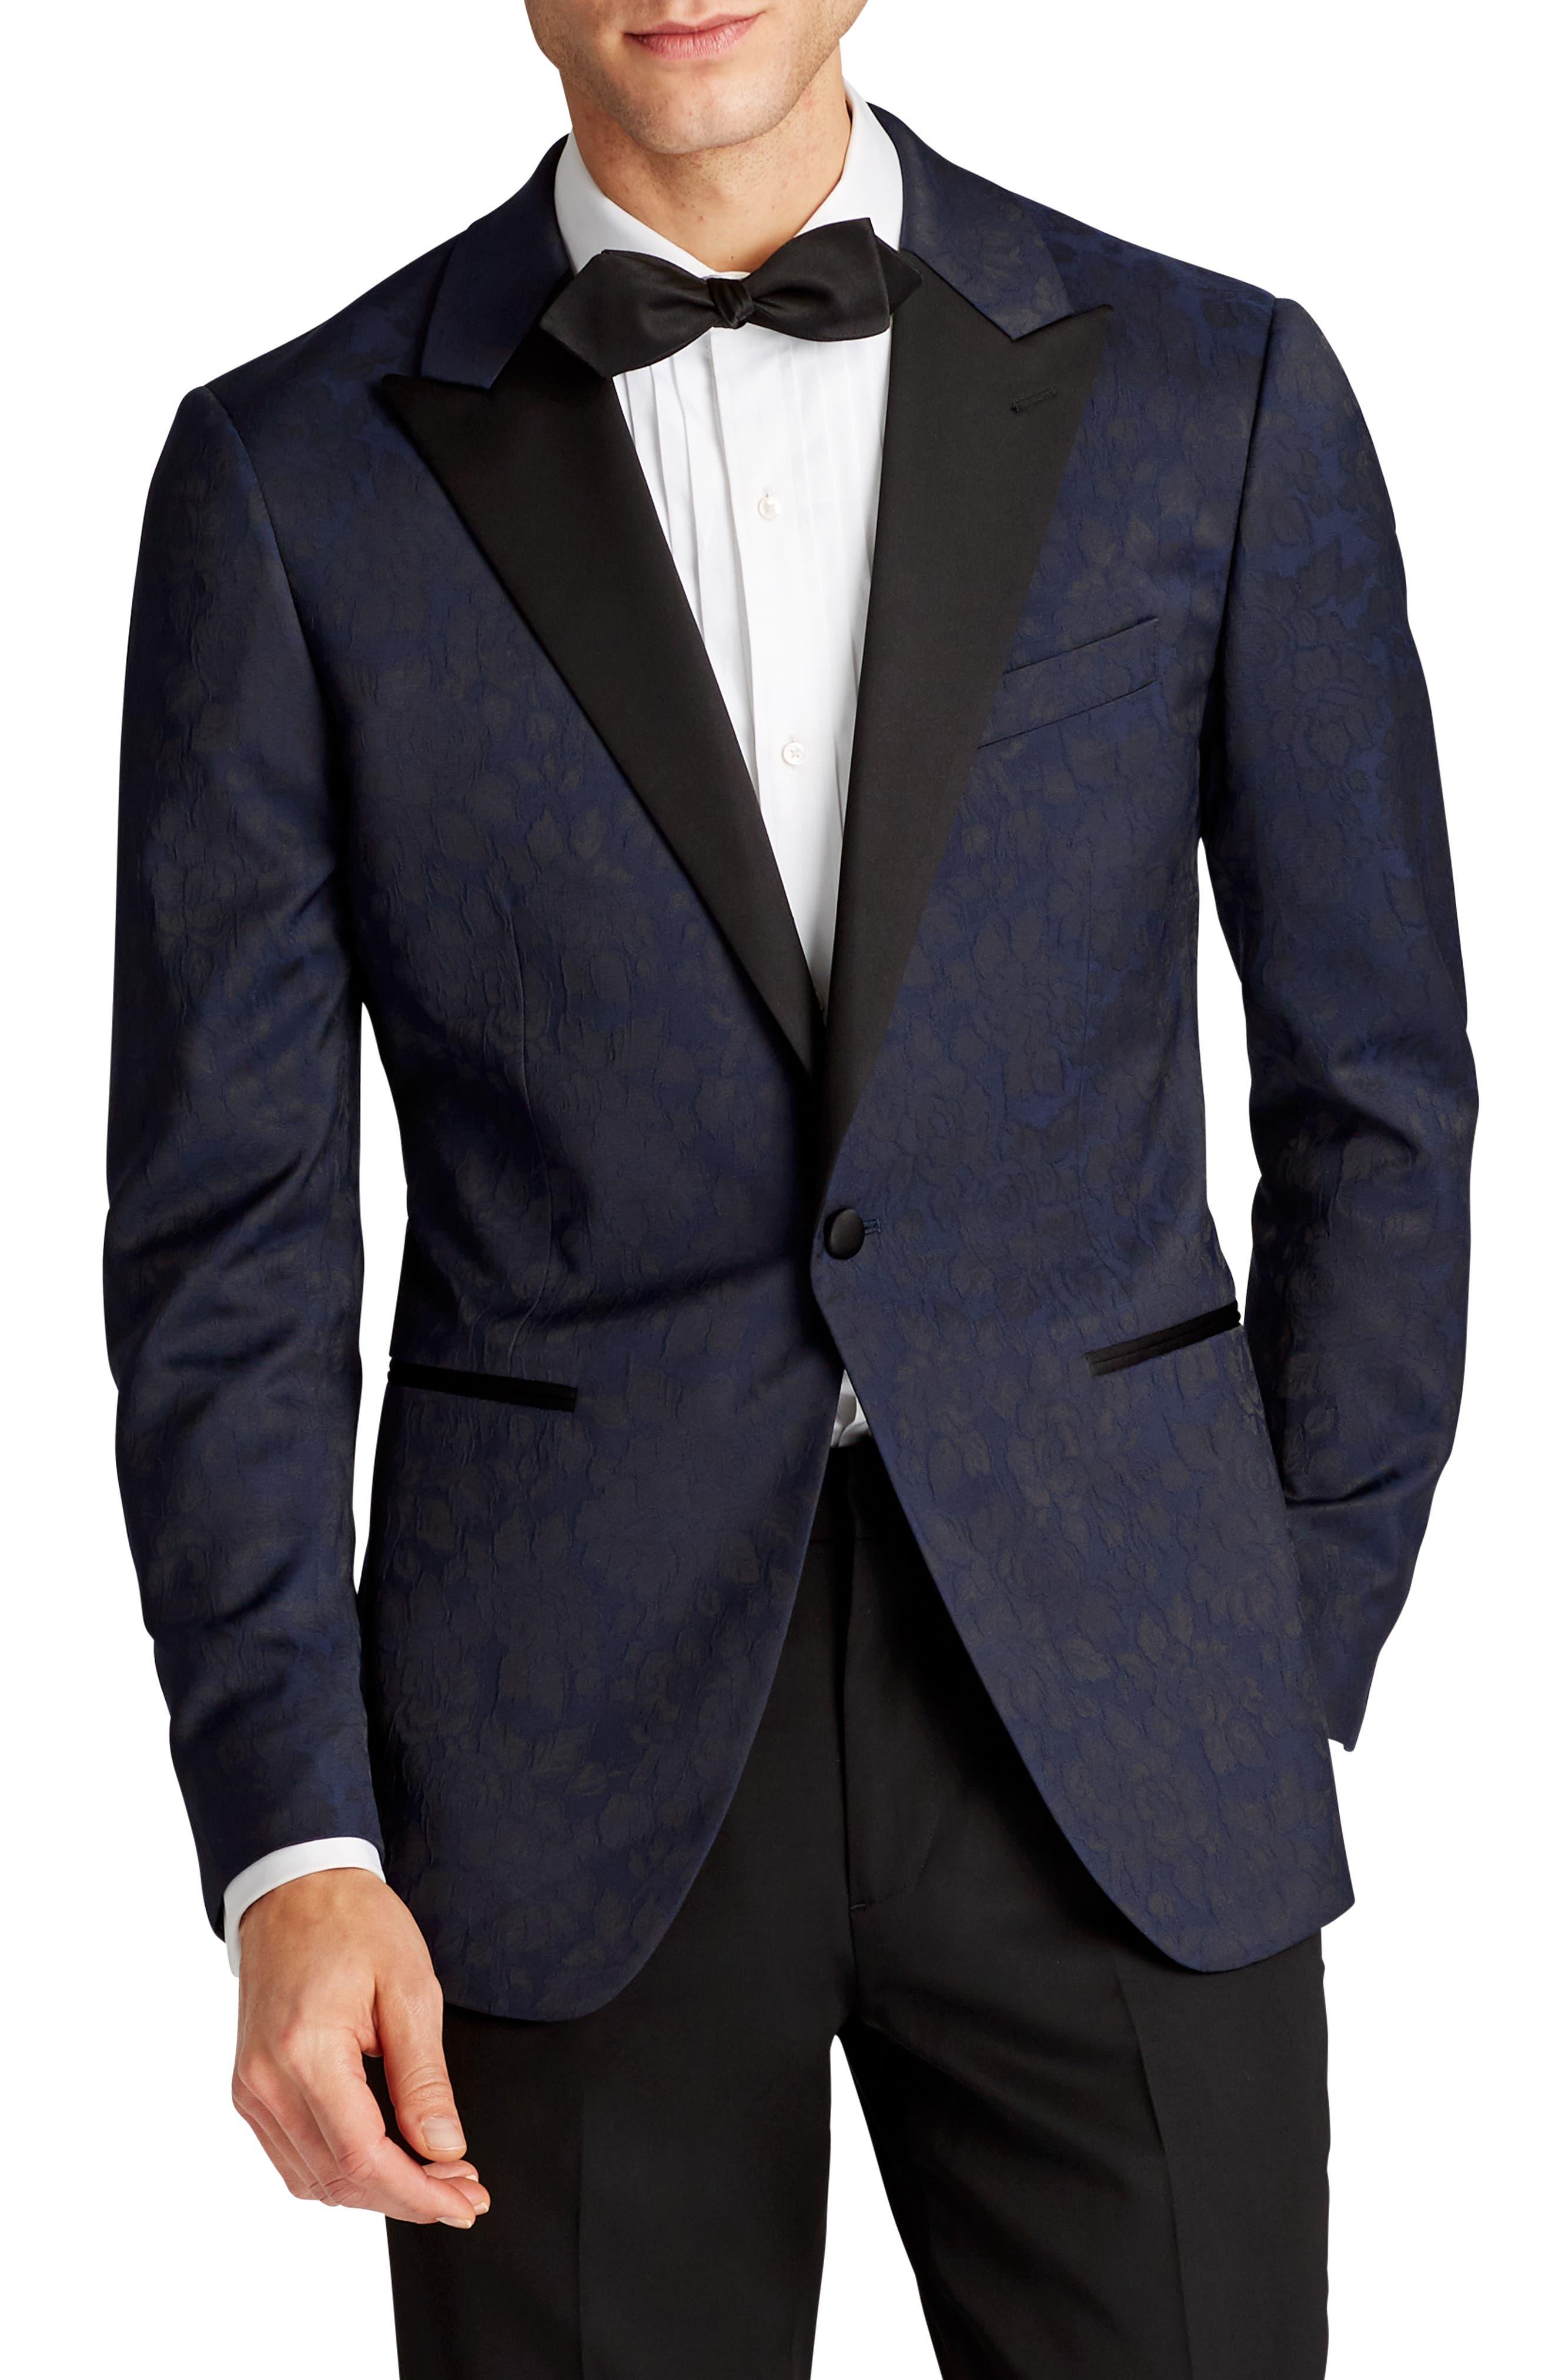 Capstone Slim Fit Stretch Dinner Jacket,                         Main,                         color,